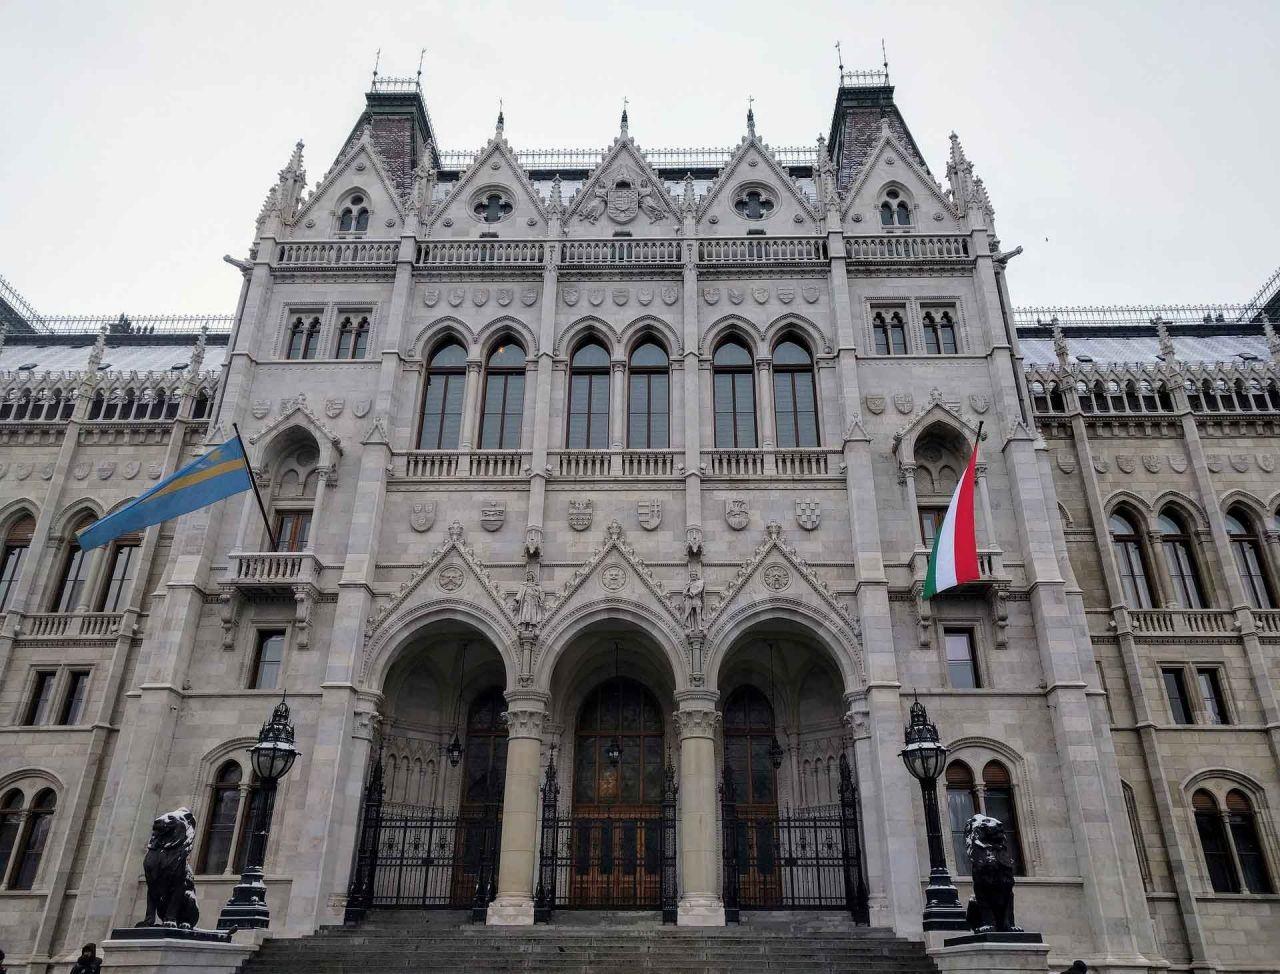 Macarıstan Parlamento Binası Turu və Folkor Performansının ardından Tunada Gemi Turu (içki seçimiyle)